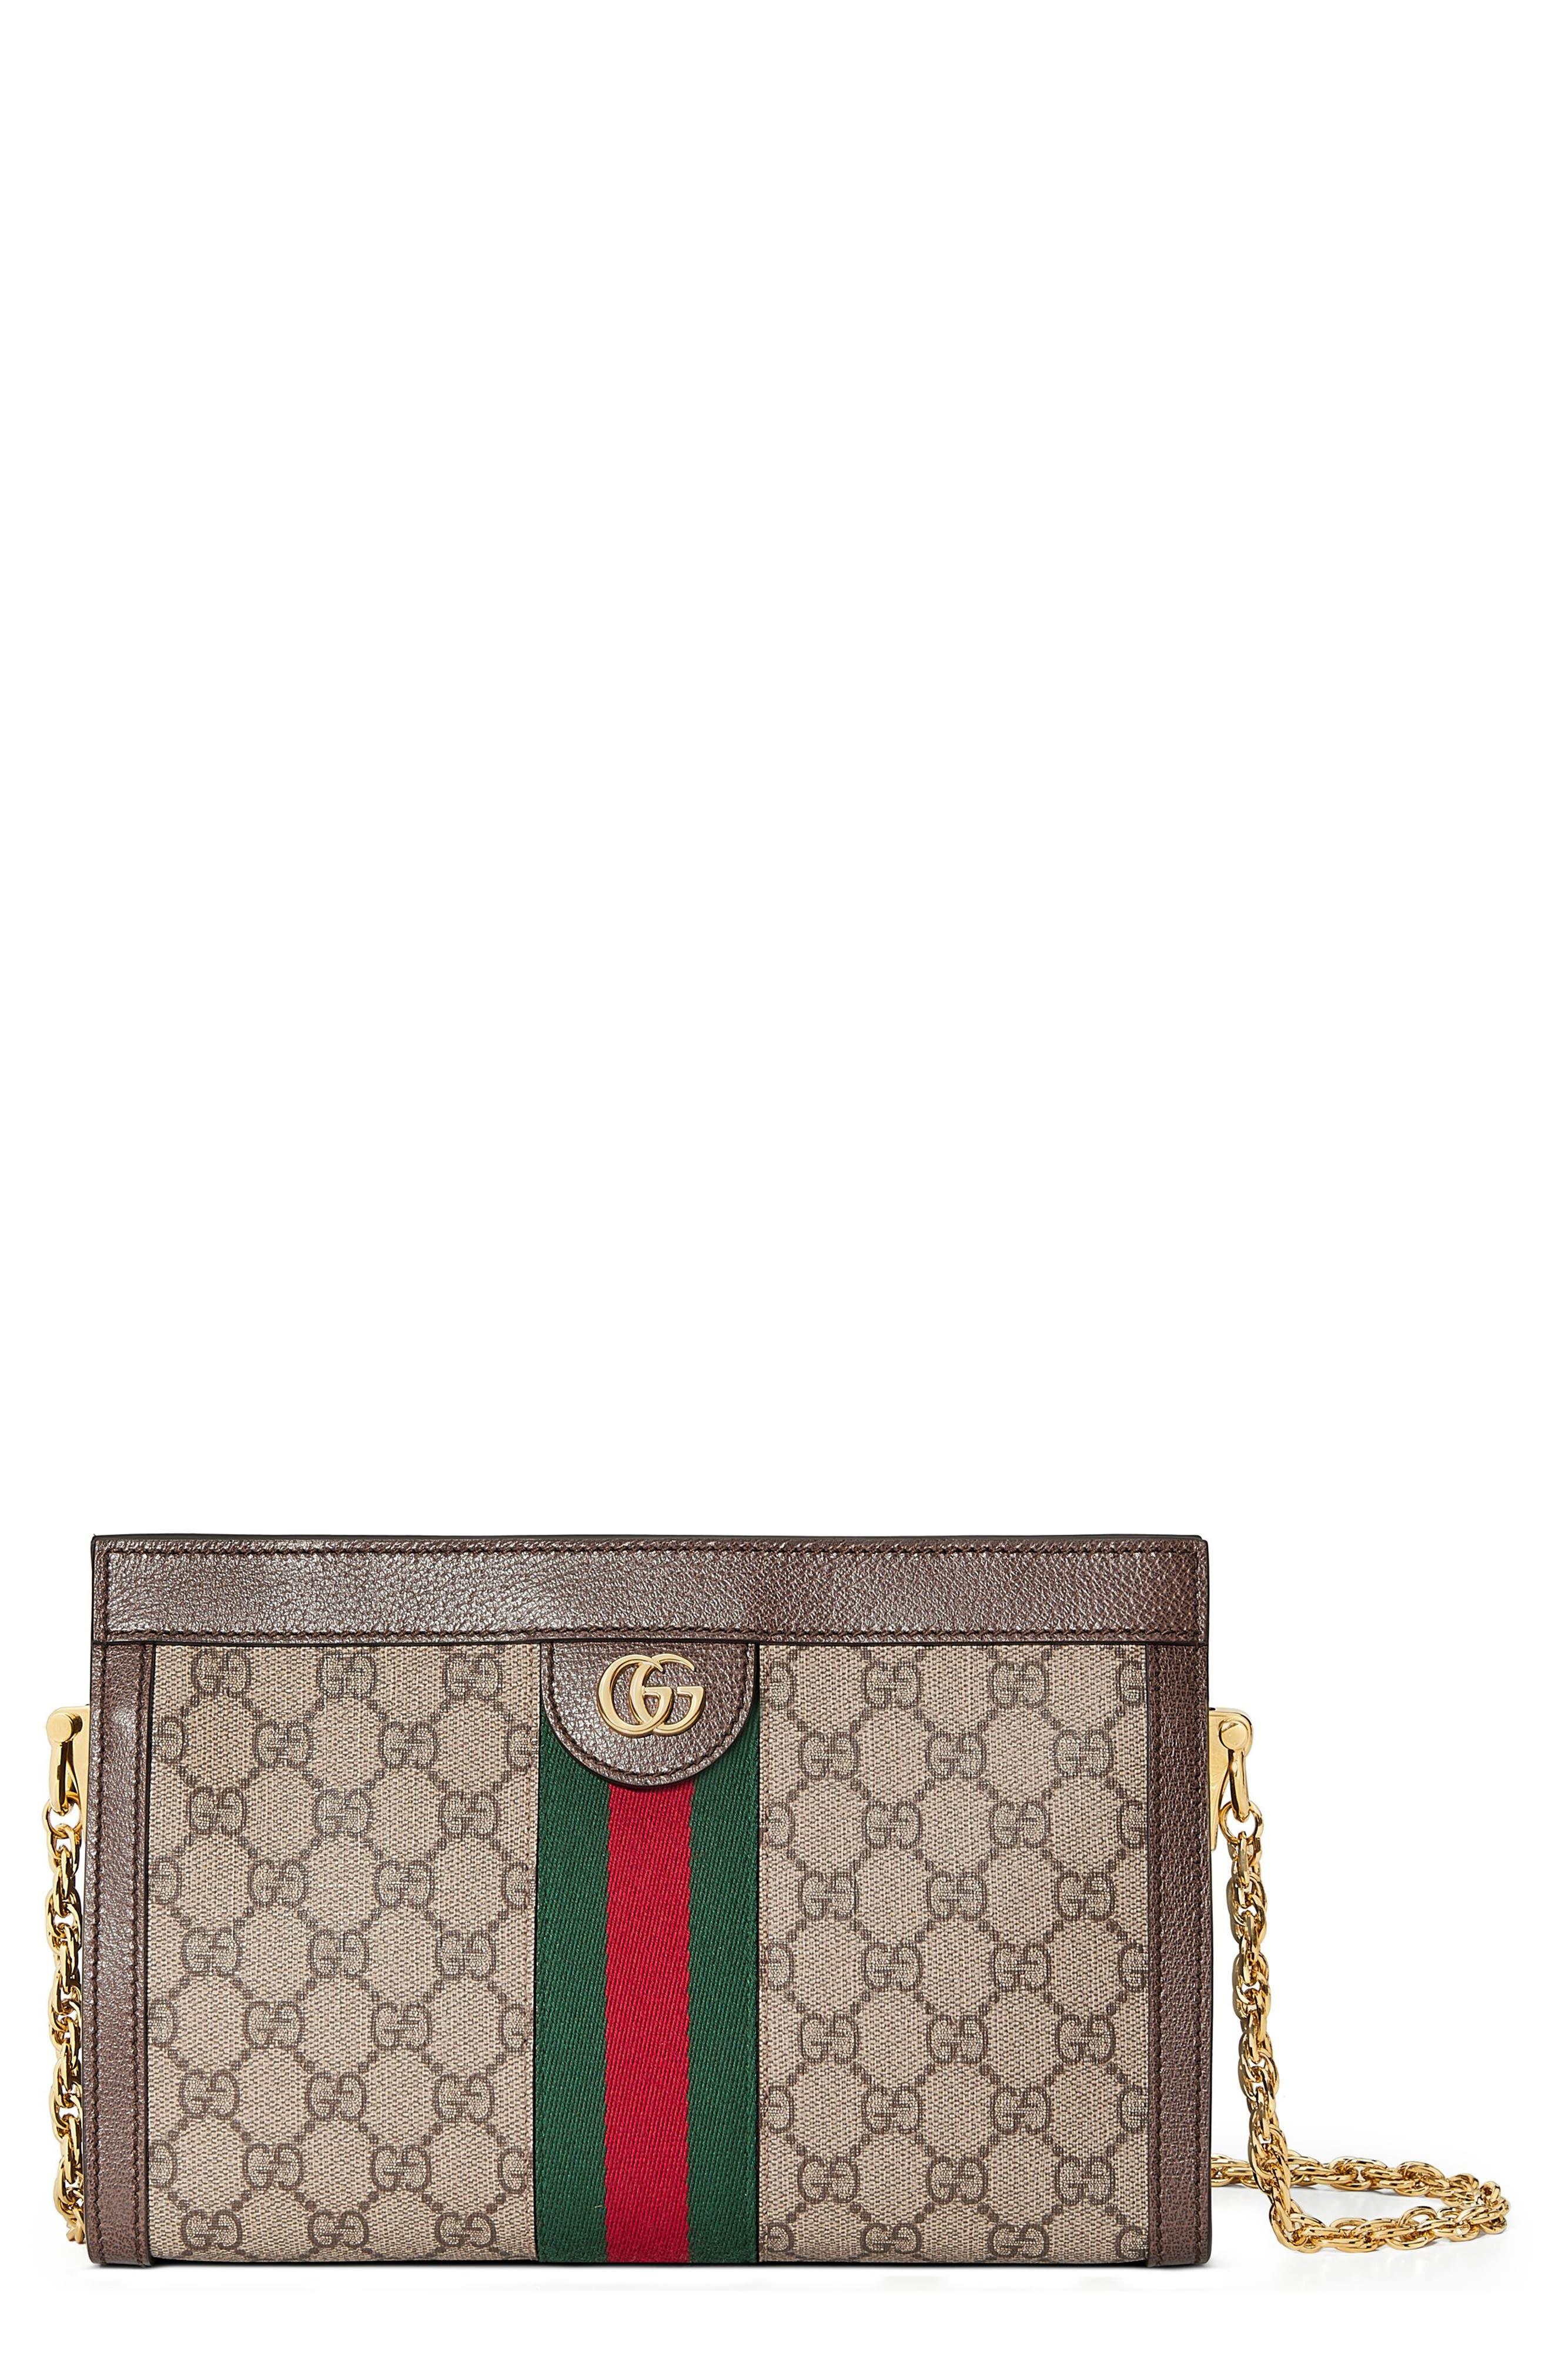 GUCCI, Small GG Supreme Shoulder Bag, Main thumbnail 1, color, BEIGE EBONY/ NERO/ VERT/ RED